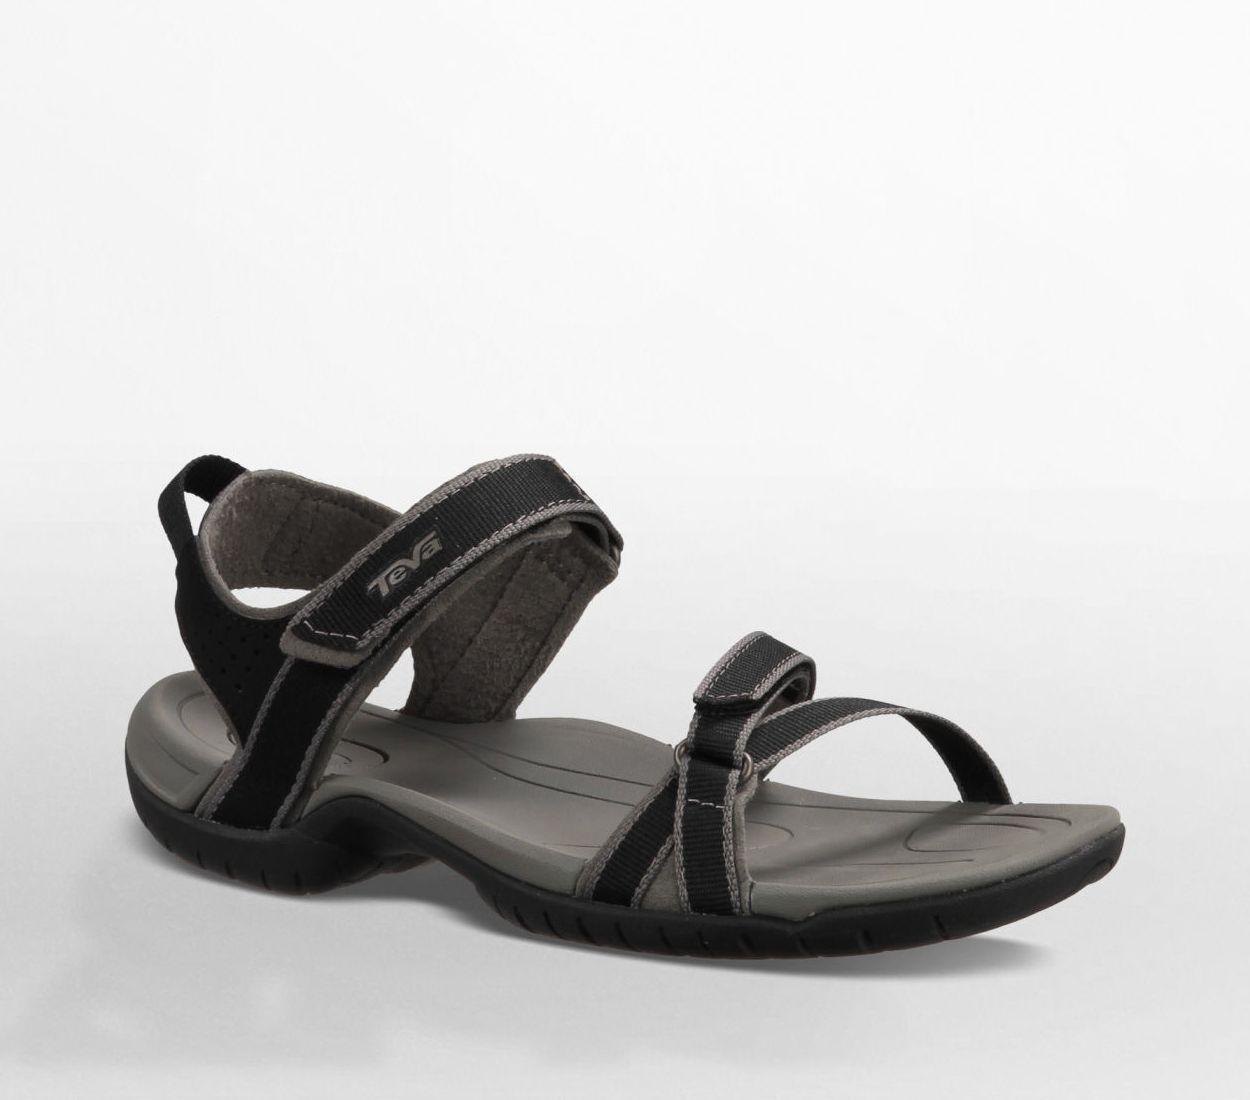 Teva Sandals Vera